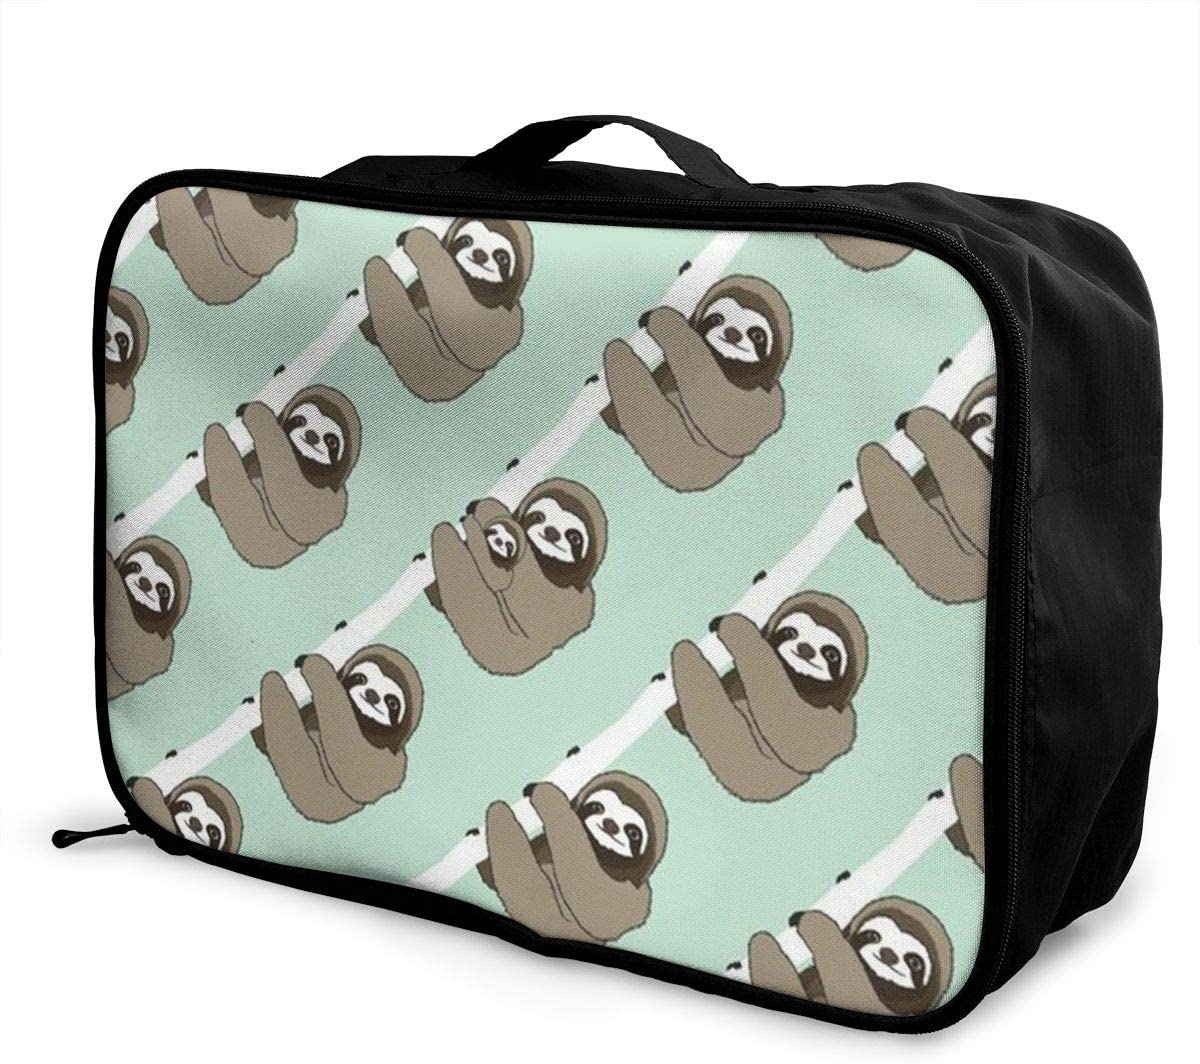 Sloth Cute Travel Carry-on Luggage Weekender Bag Overnight Tote Flight Duffel In Trolley Handle